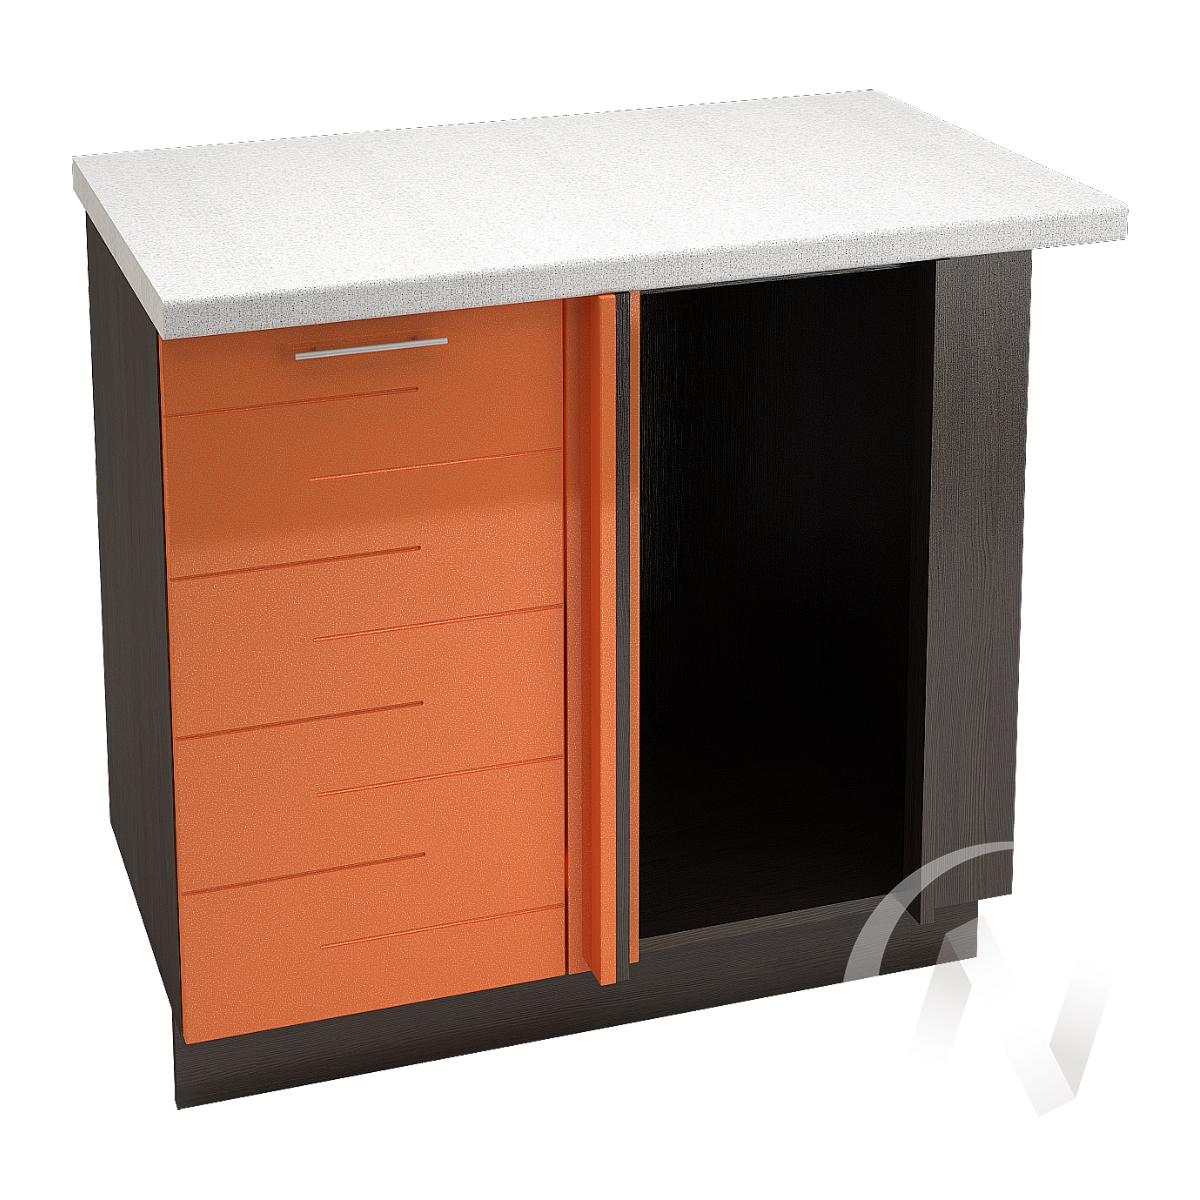 "Кухня ""Техно"": Шкаф нижний угловой 990М, ШНУ 990М (корпус венге)"